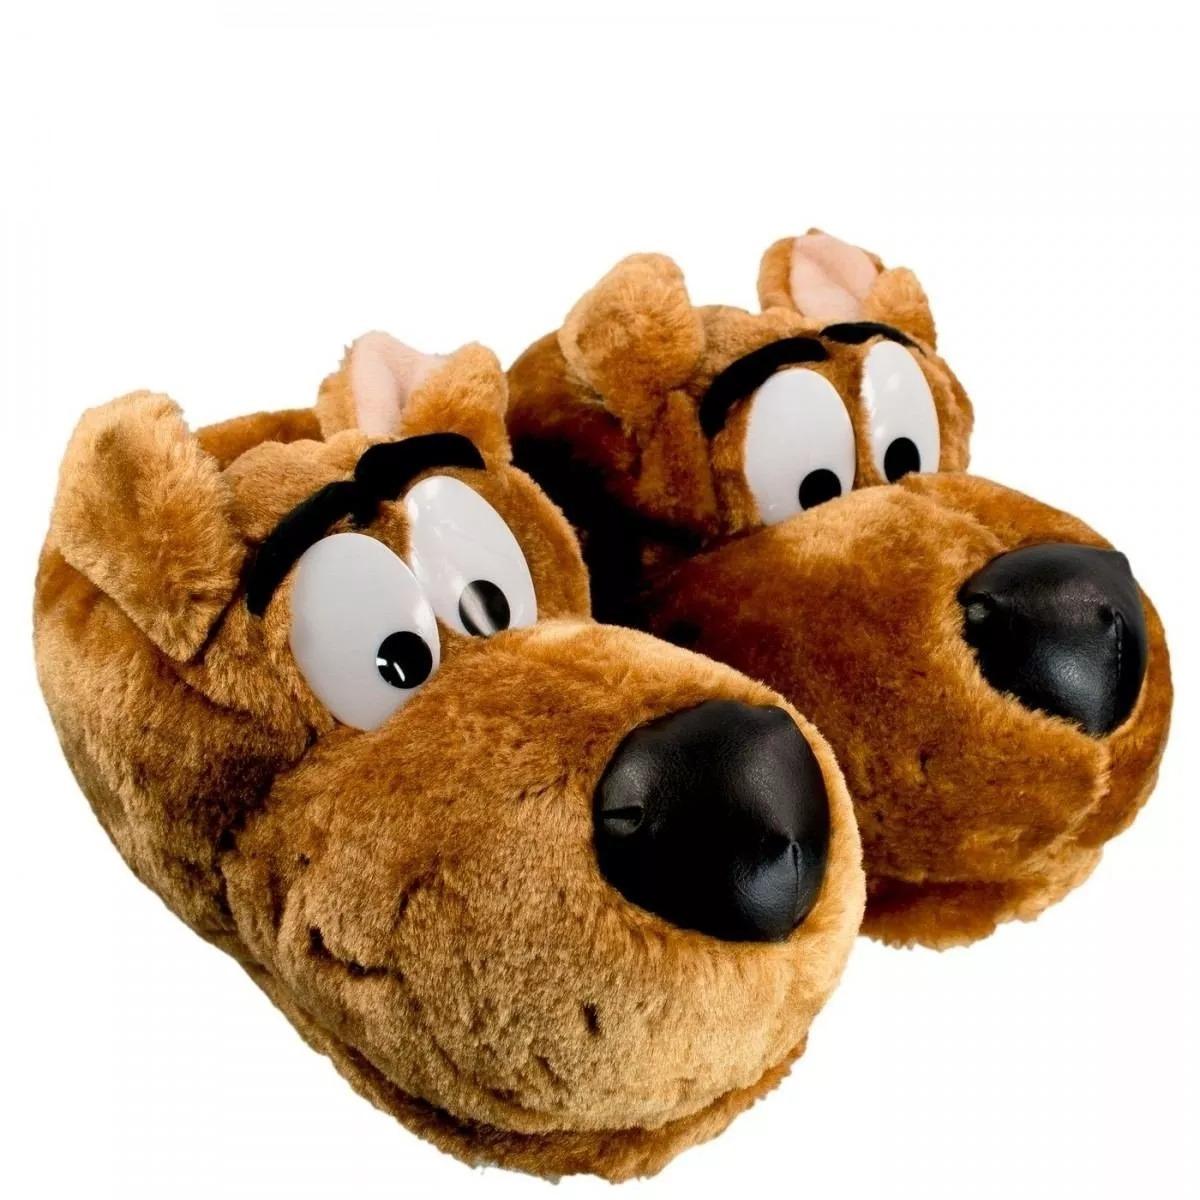 2645a54cae7b59 Pantufa Scooby Doo Ricsen 34/36 37/39 40/42 Unissex